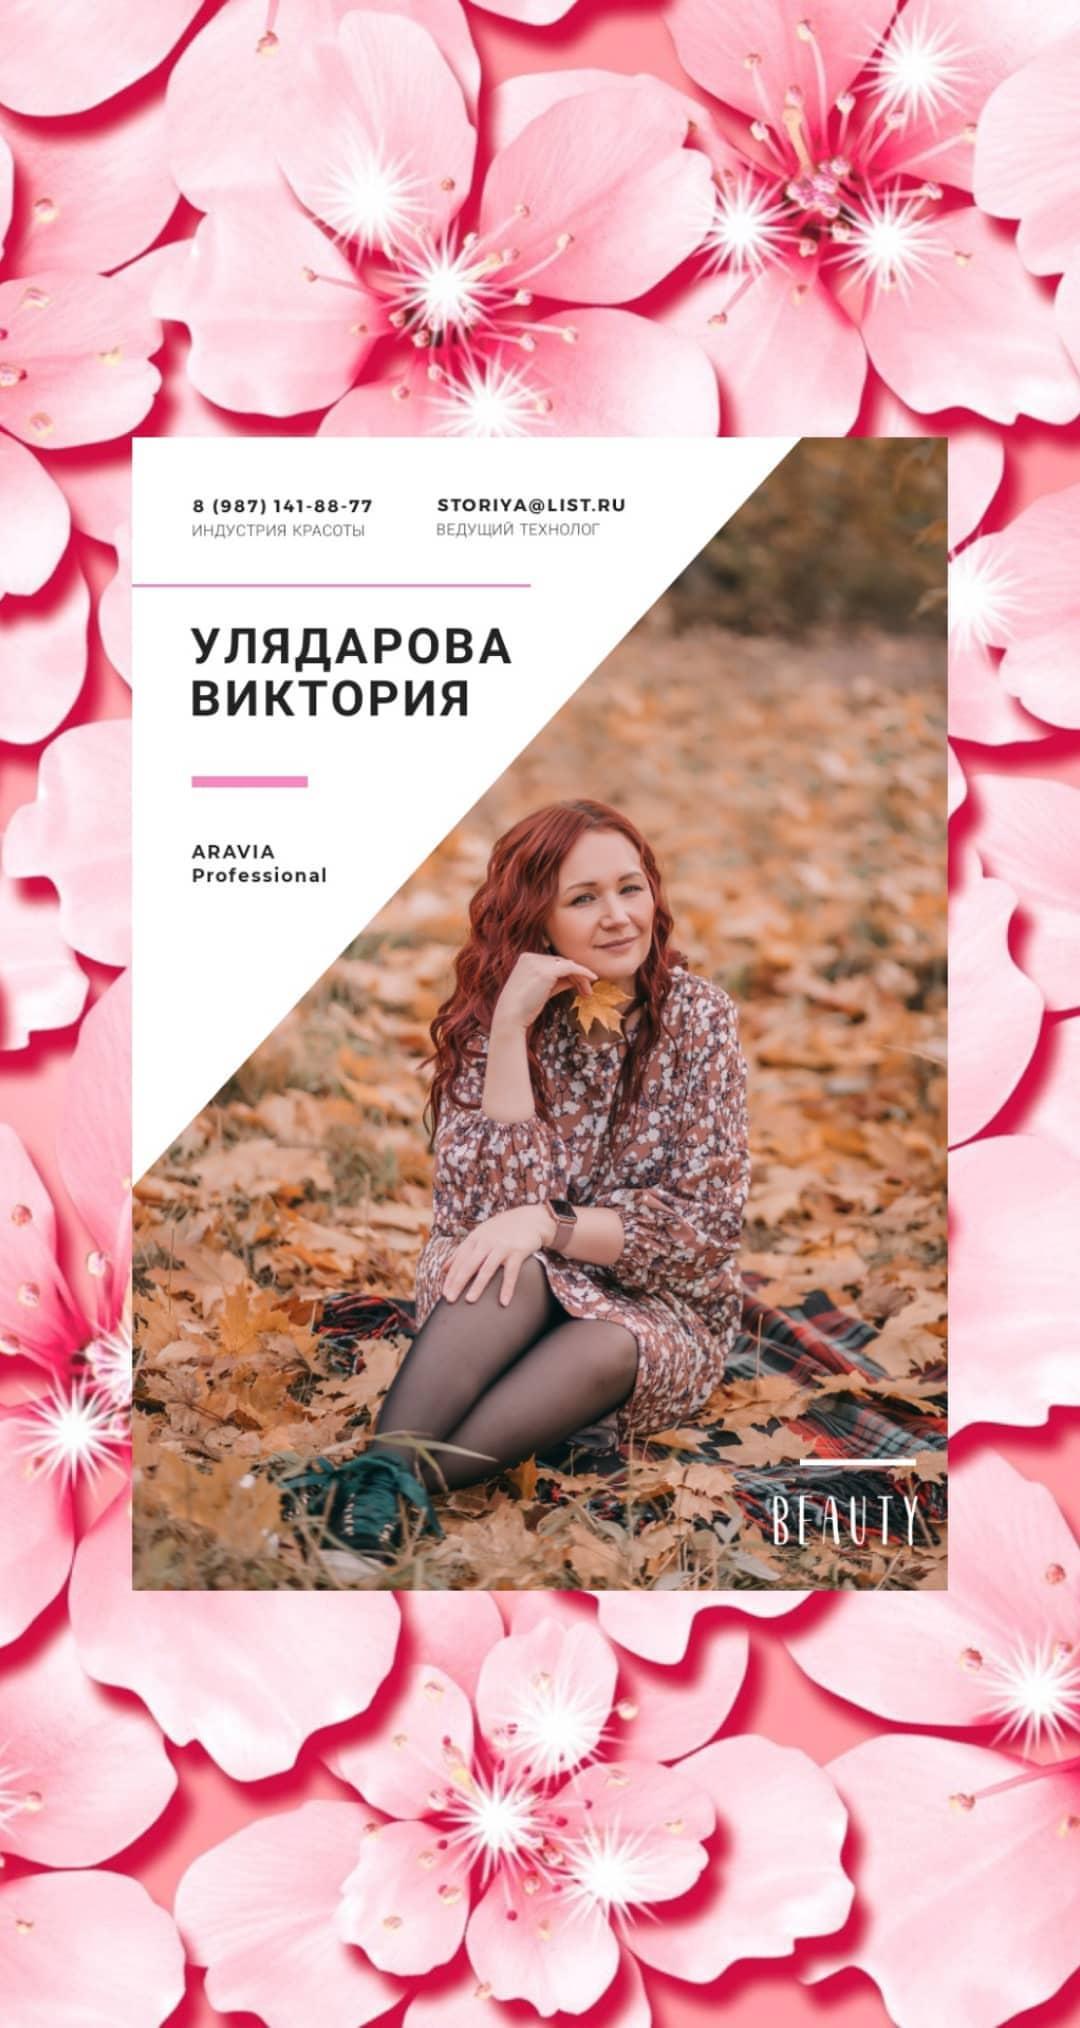 aravia_angelskui.com